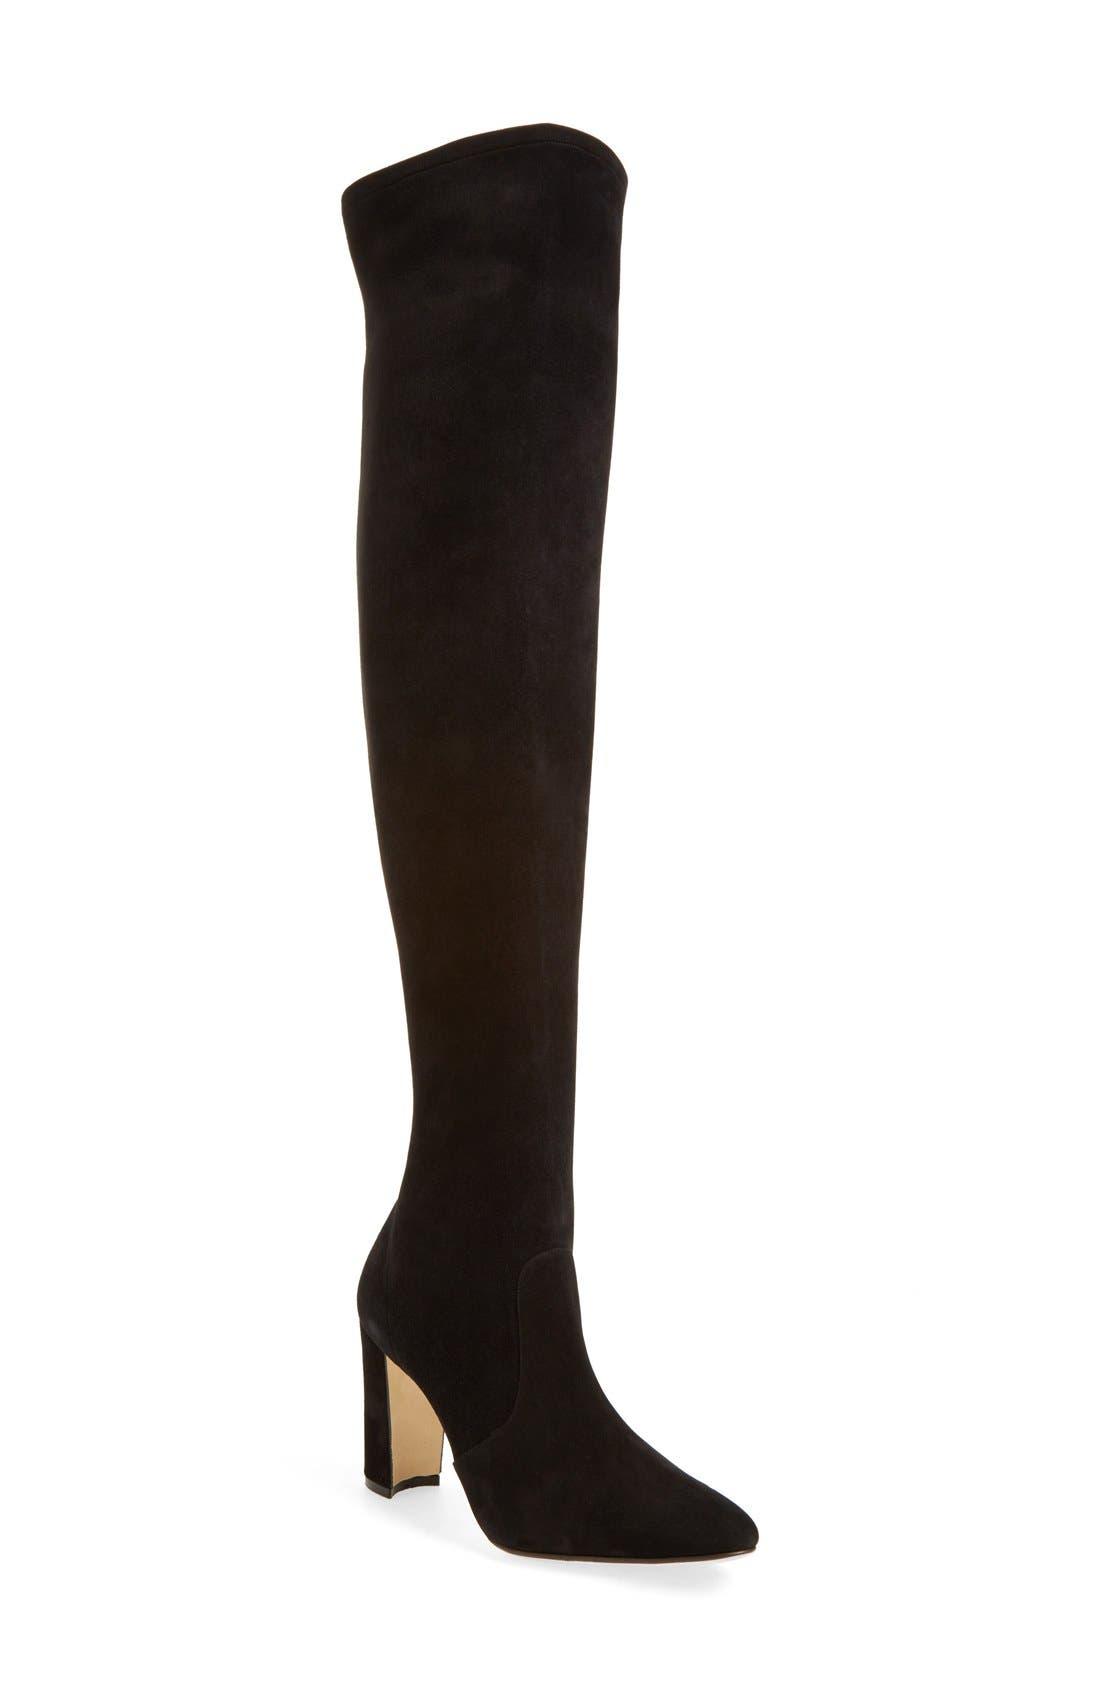 Alternate Image 1 Selected - Manolo Blahnik 'Pascalla' Over the Knee Boot (Women)